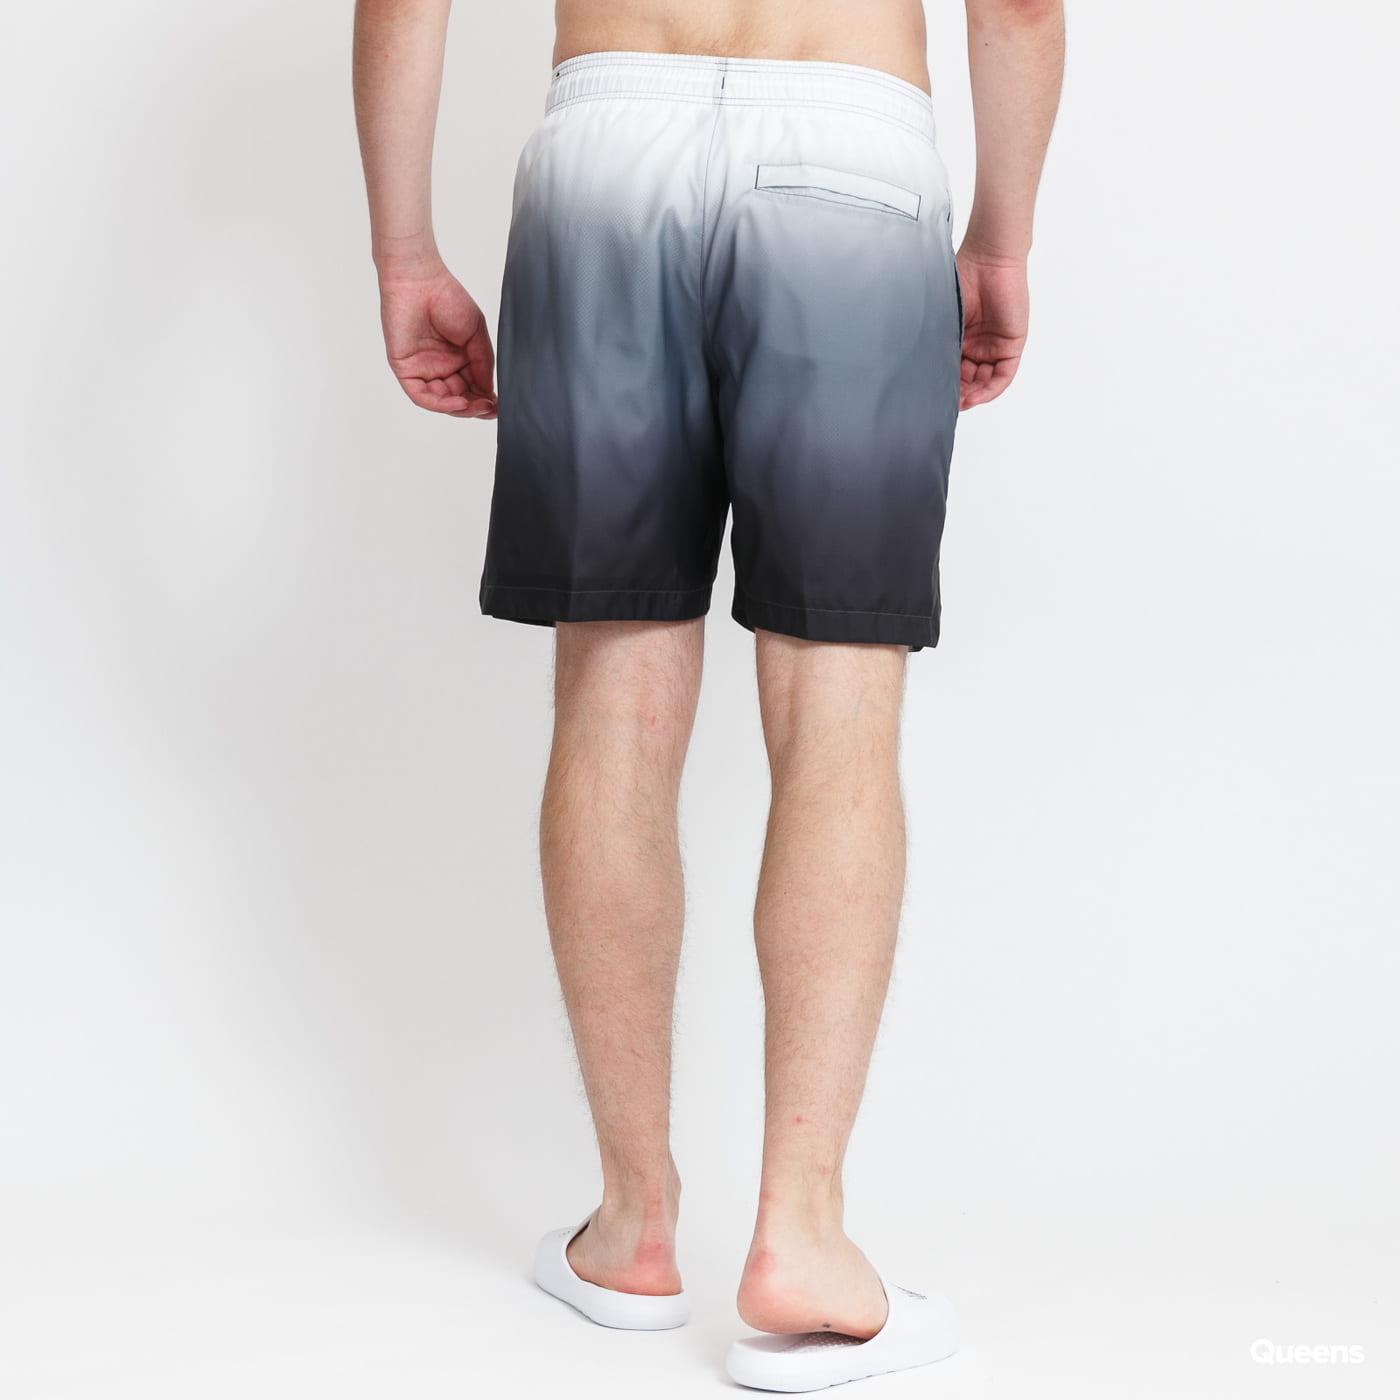 Jordan M J Sport DNA HBR Pool Short tmavě šedé / bílé